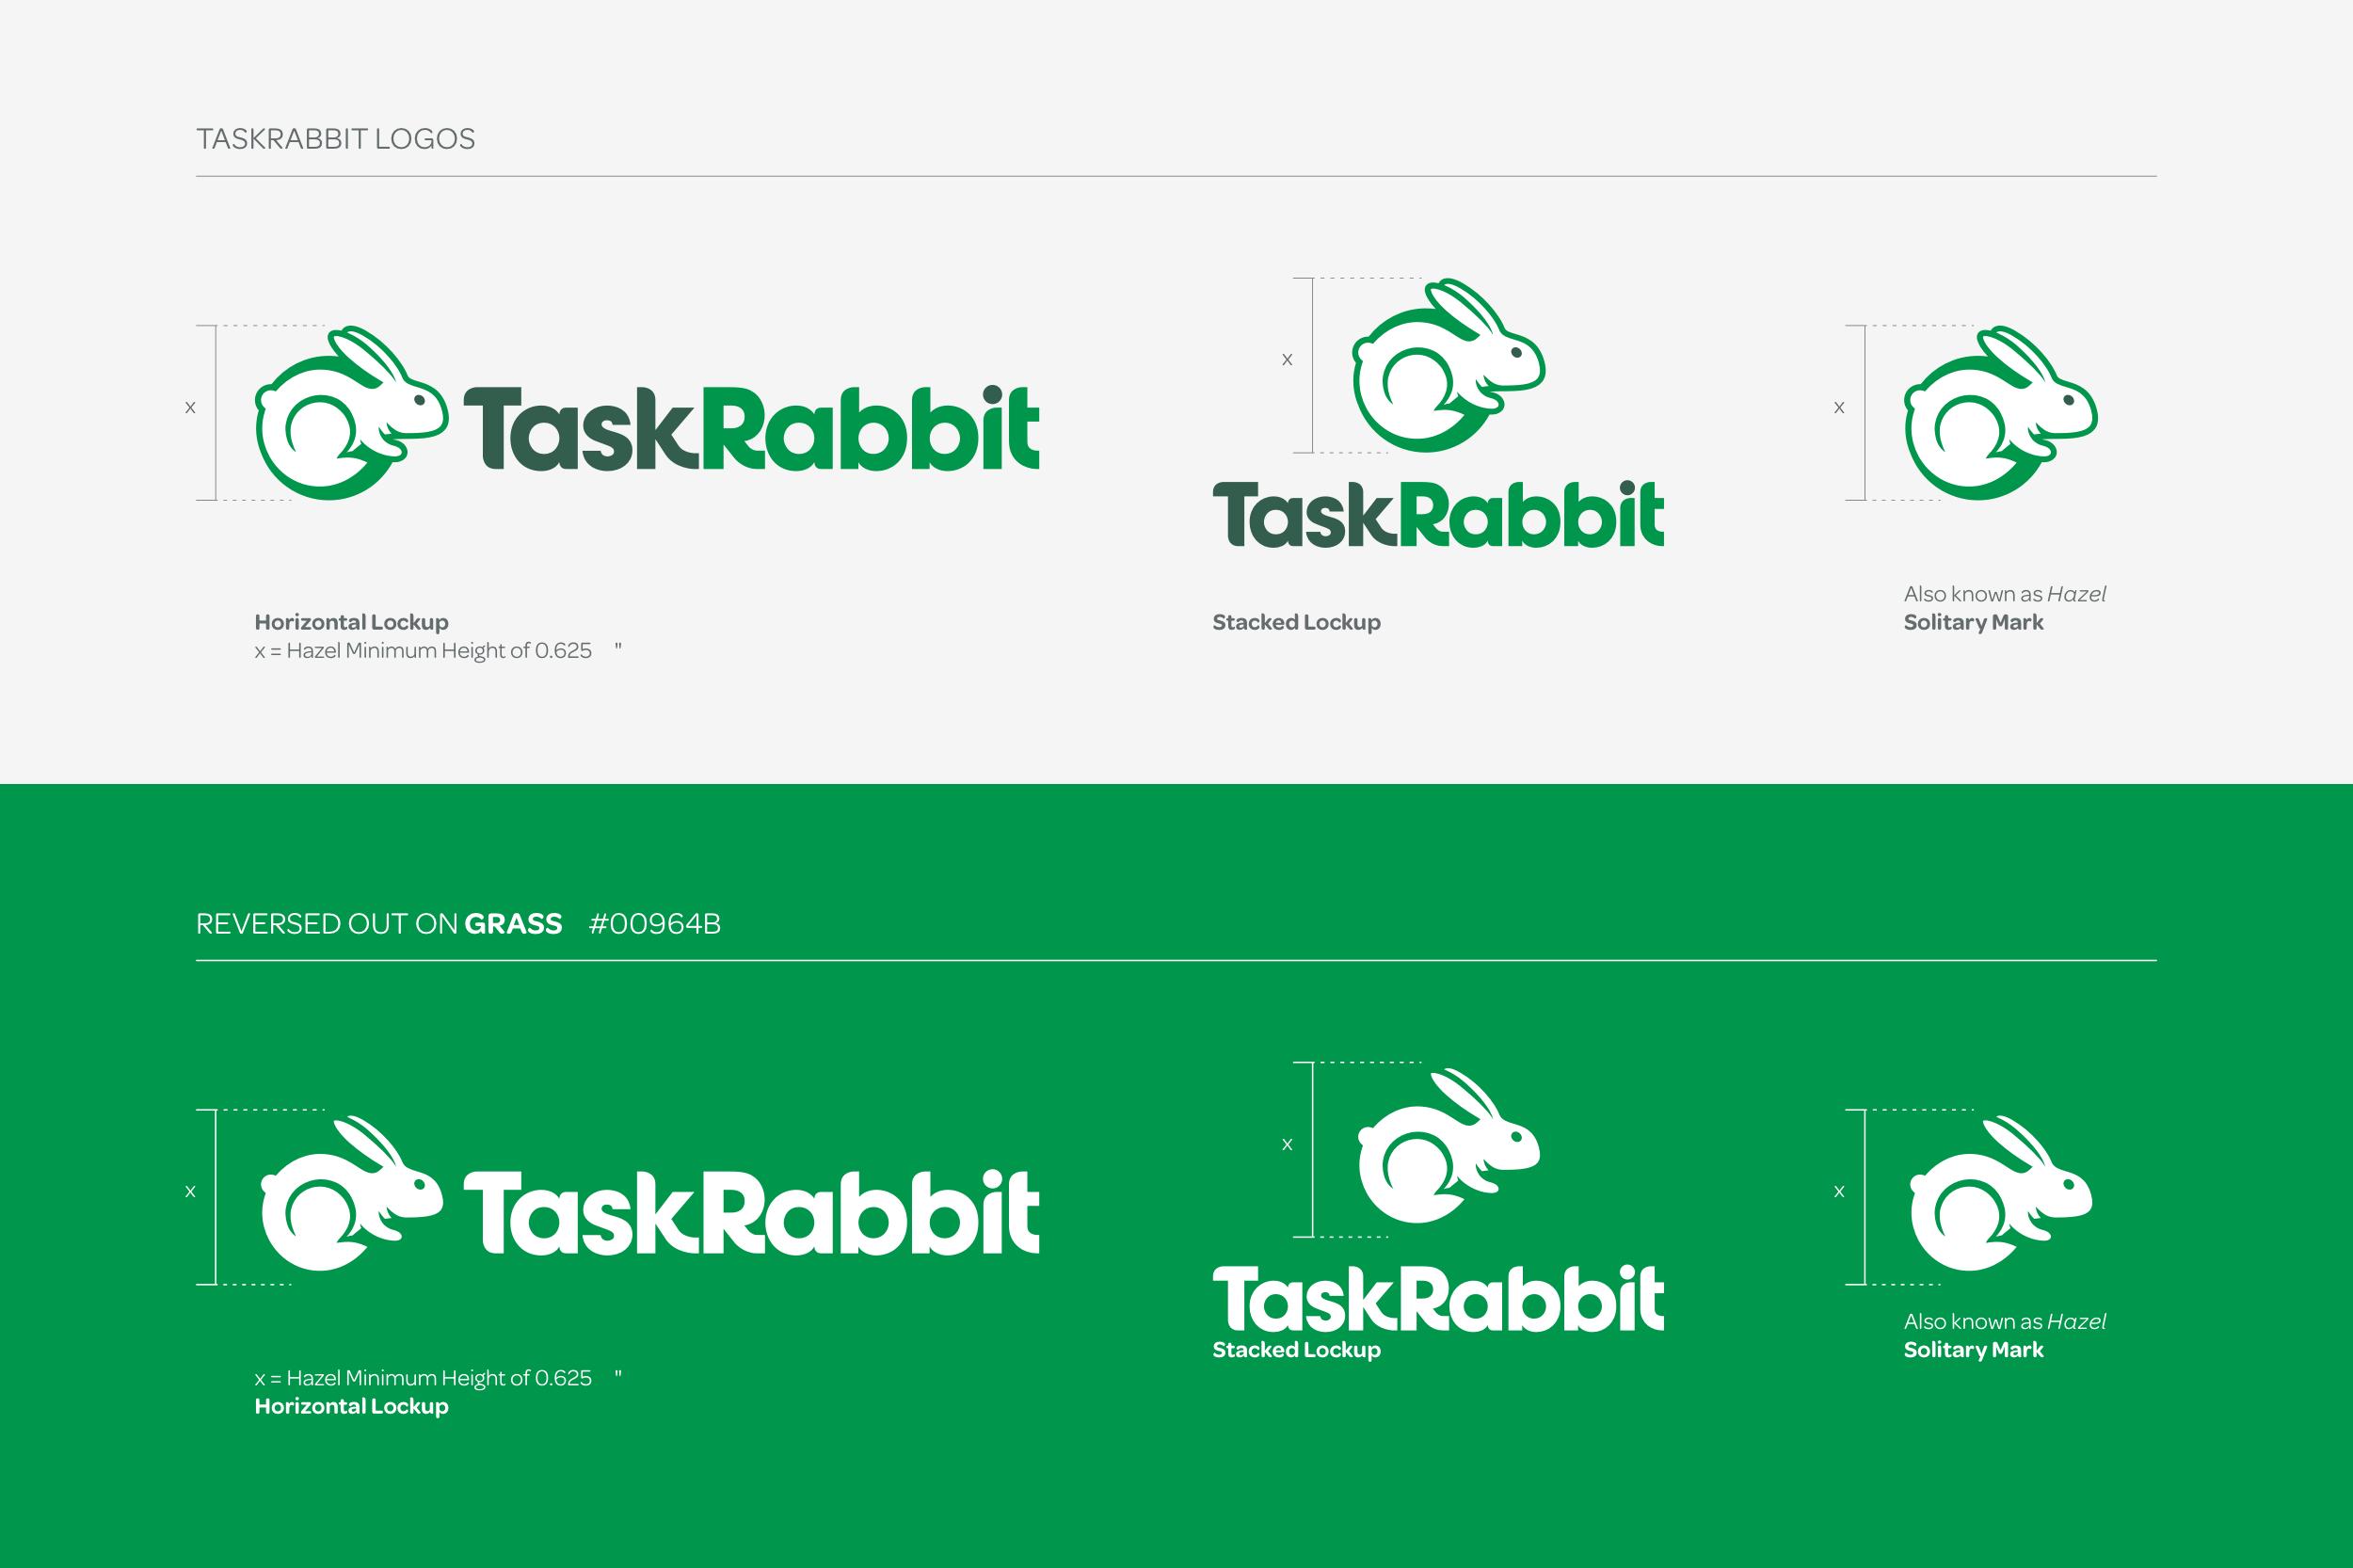 5-taskrabbit-spacing@2x.png